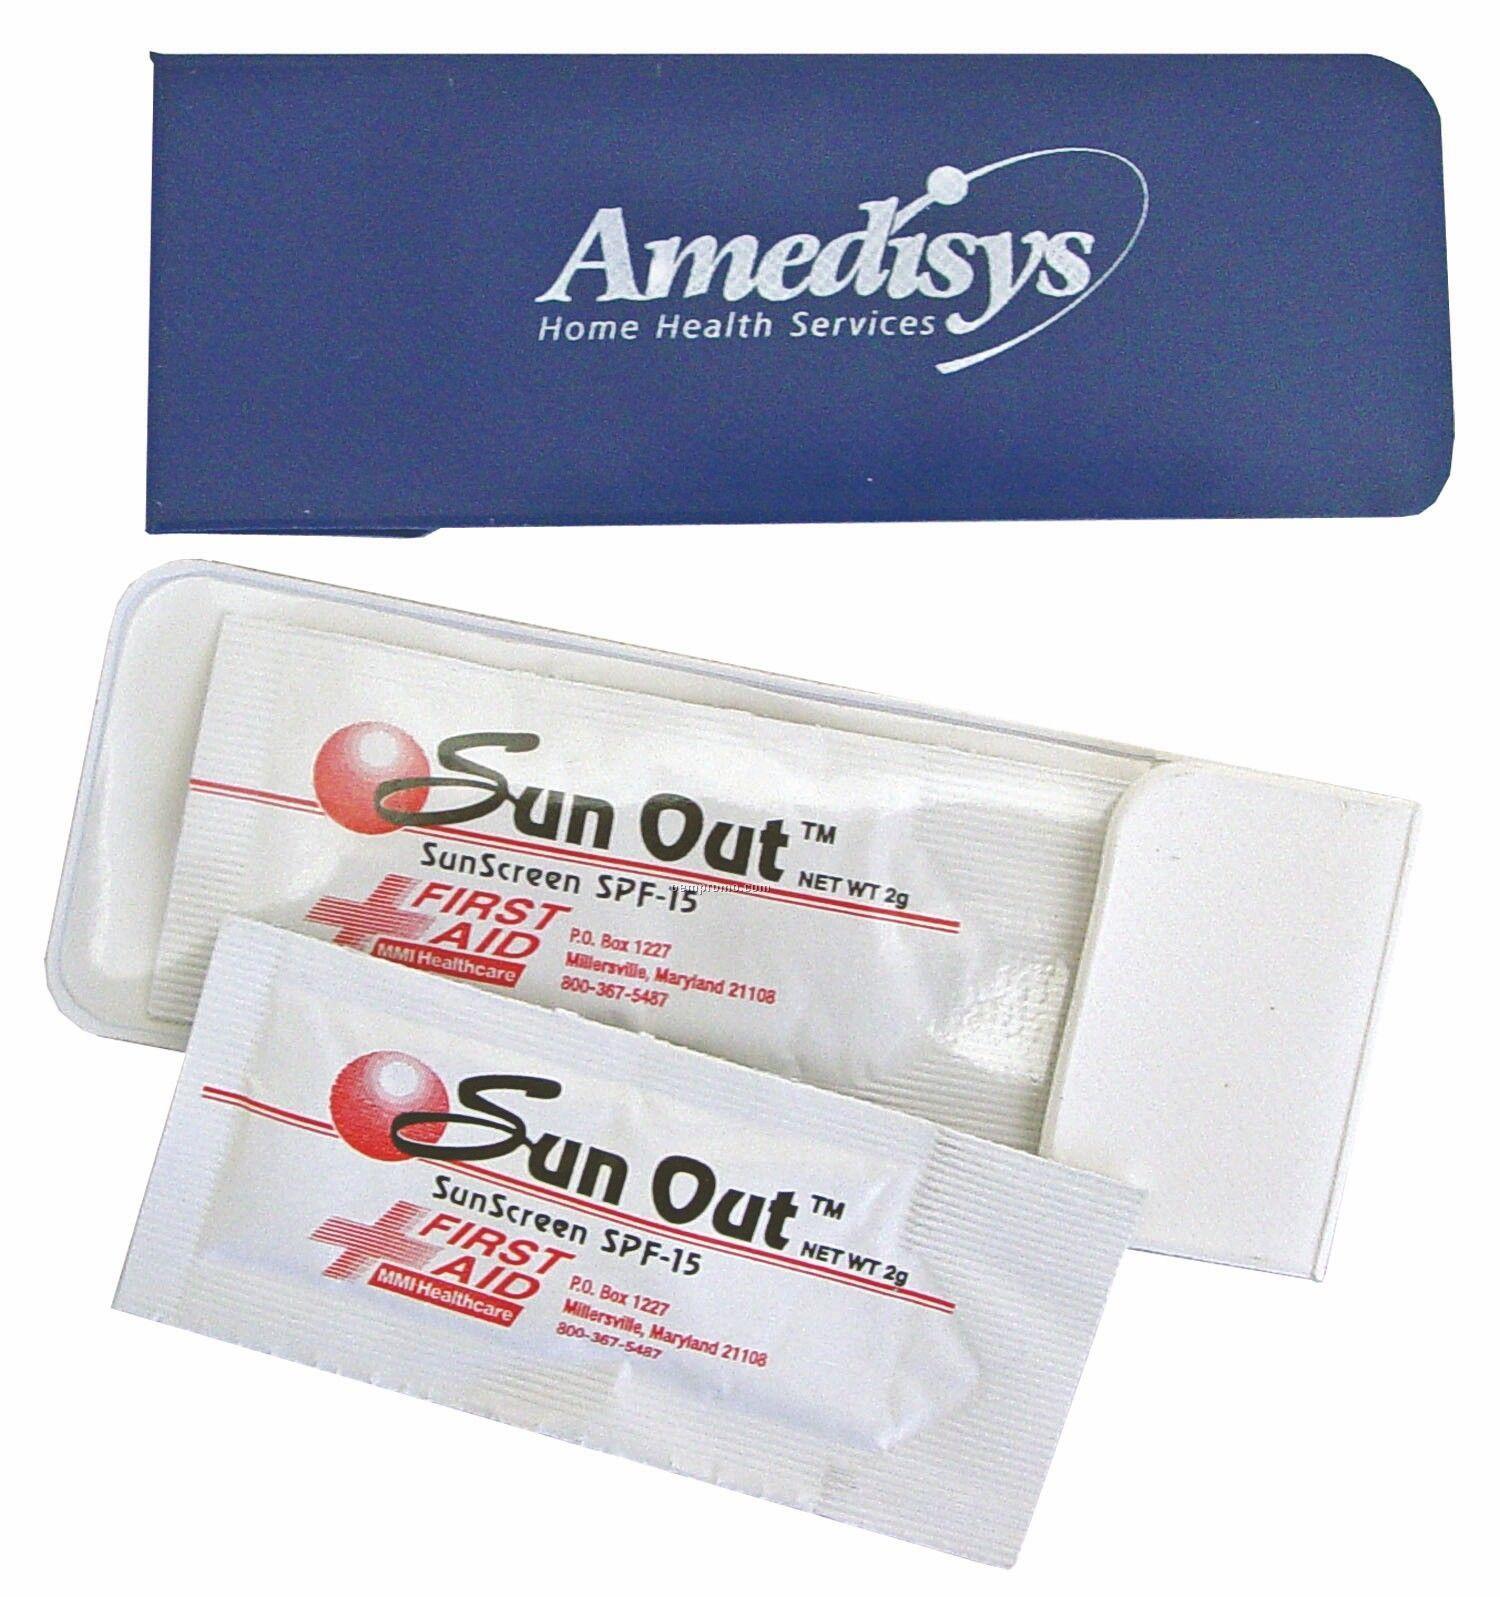 Moisturizing Sunscreen Packets In Vinyl Case - Blank